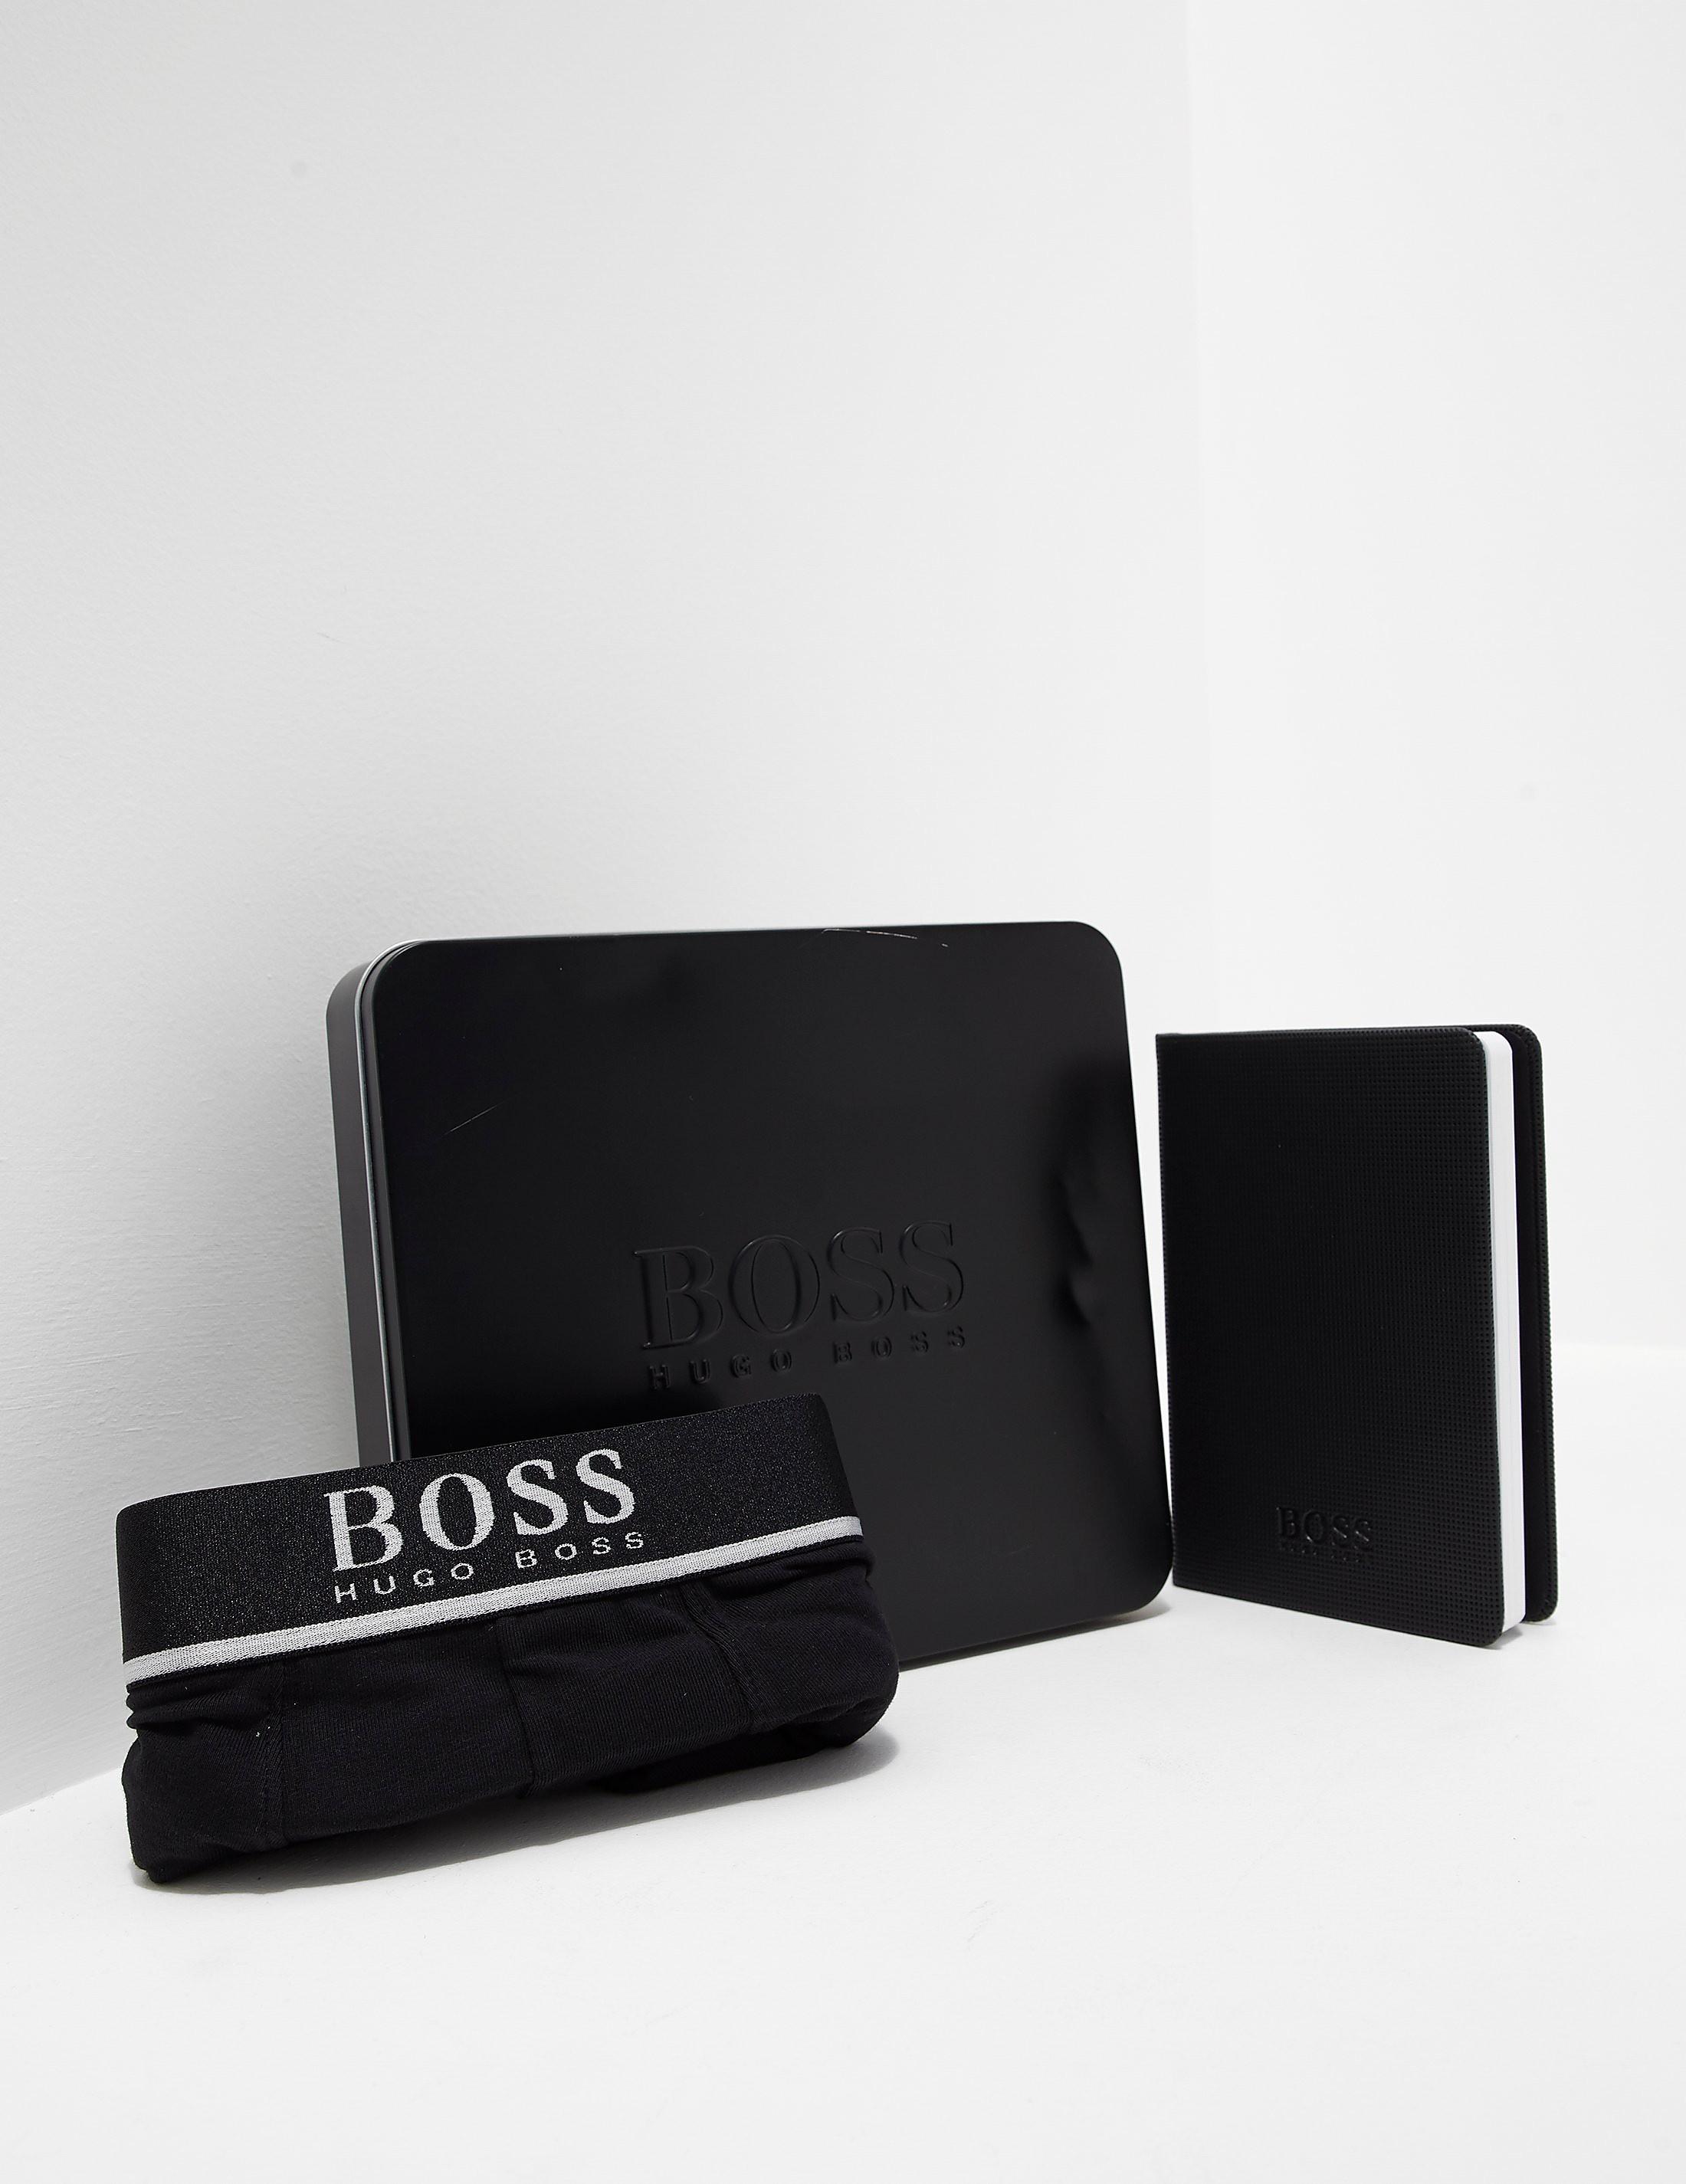 BOSS Boxer Shorts and Note Pad Gift Set